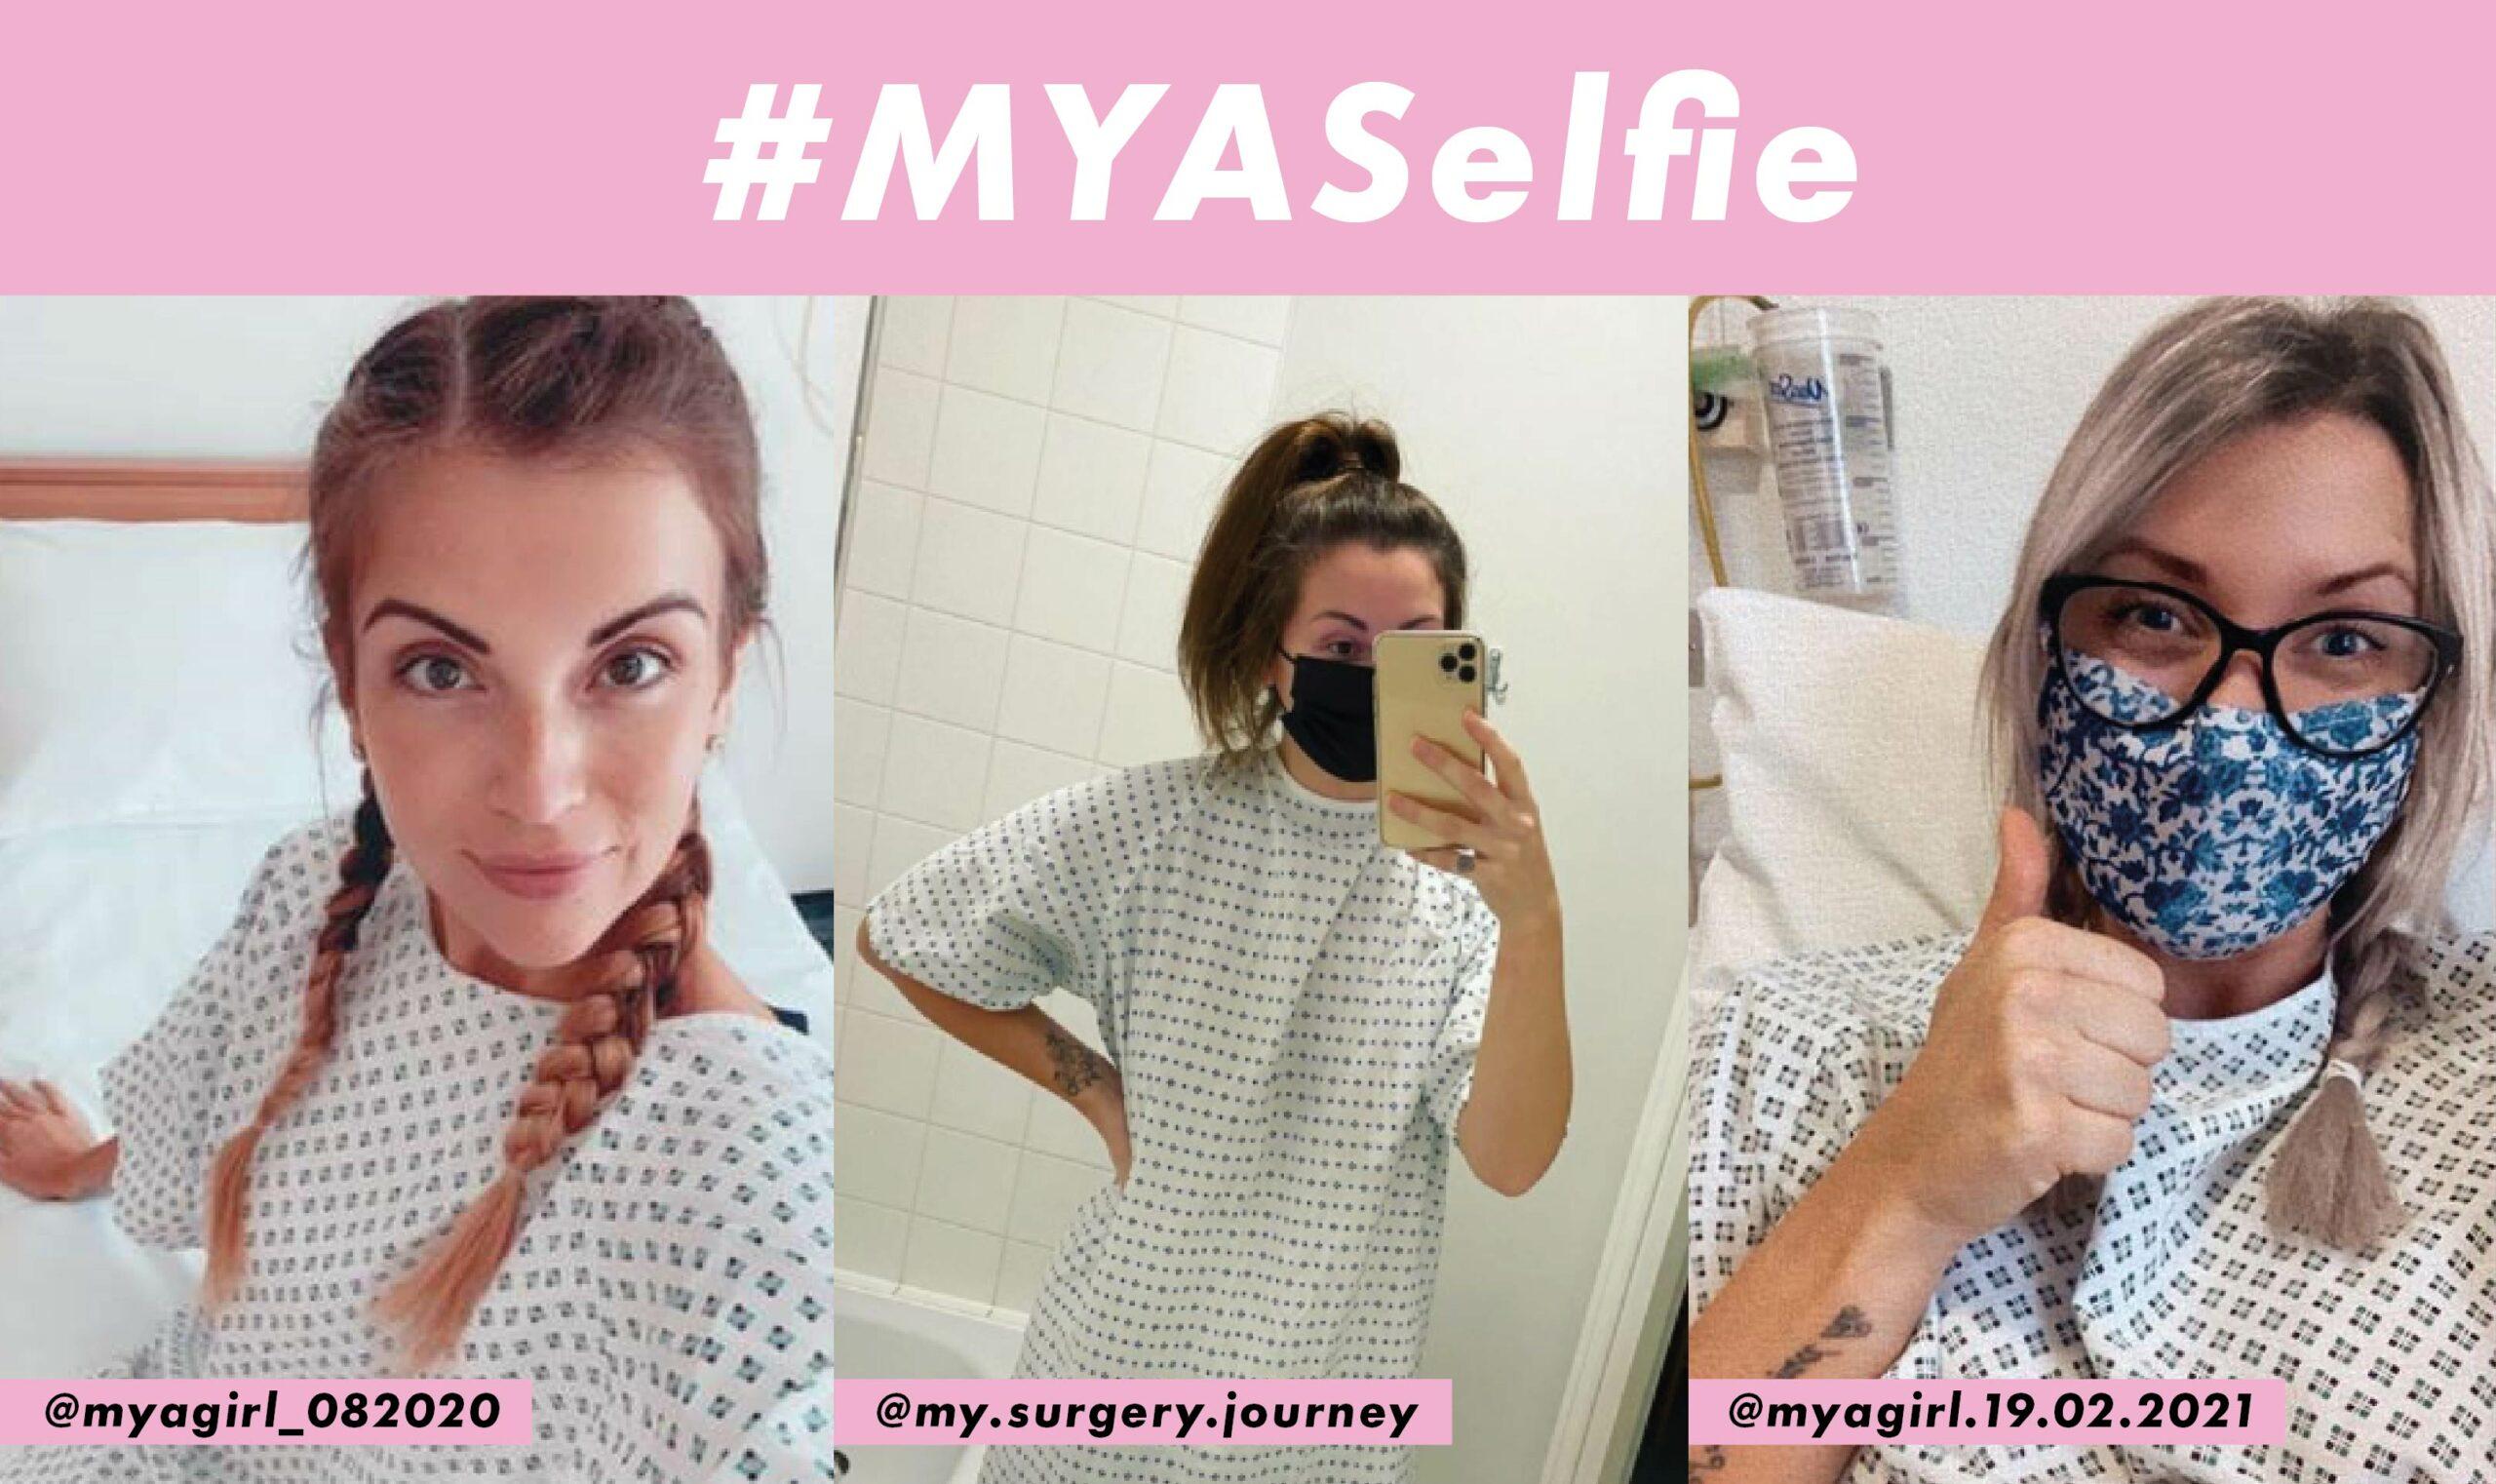 Selfies of patients taken at the MYA hospital